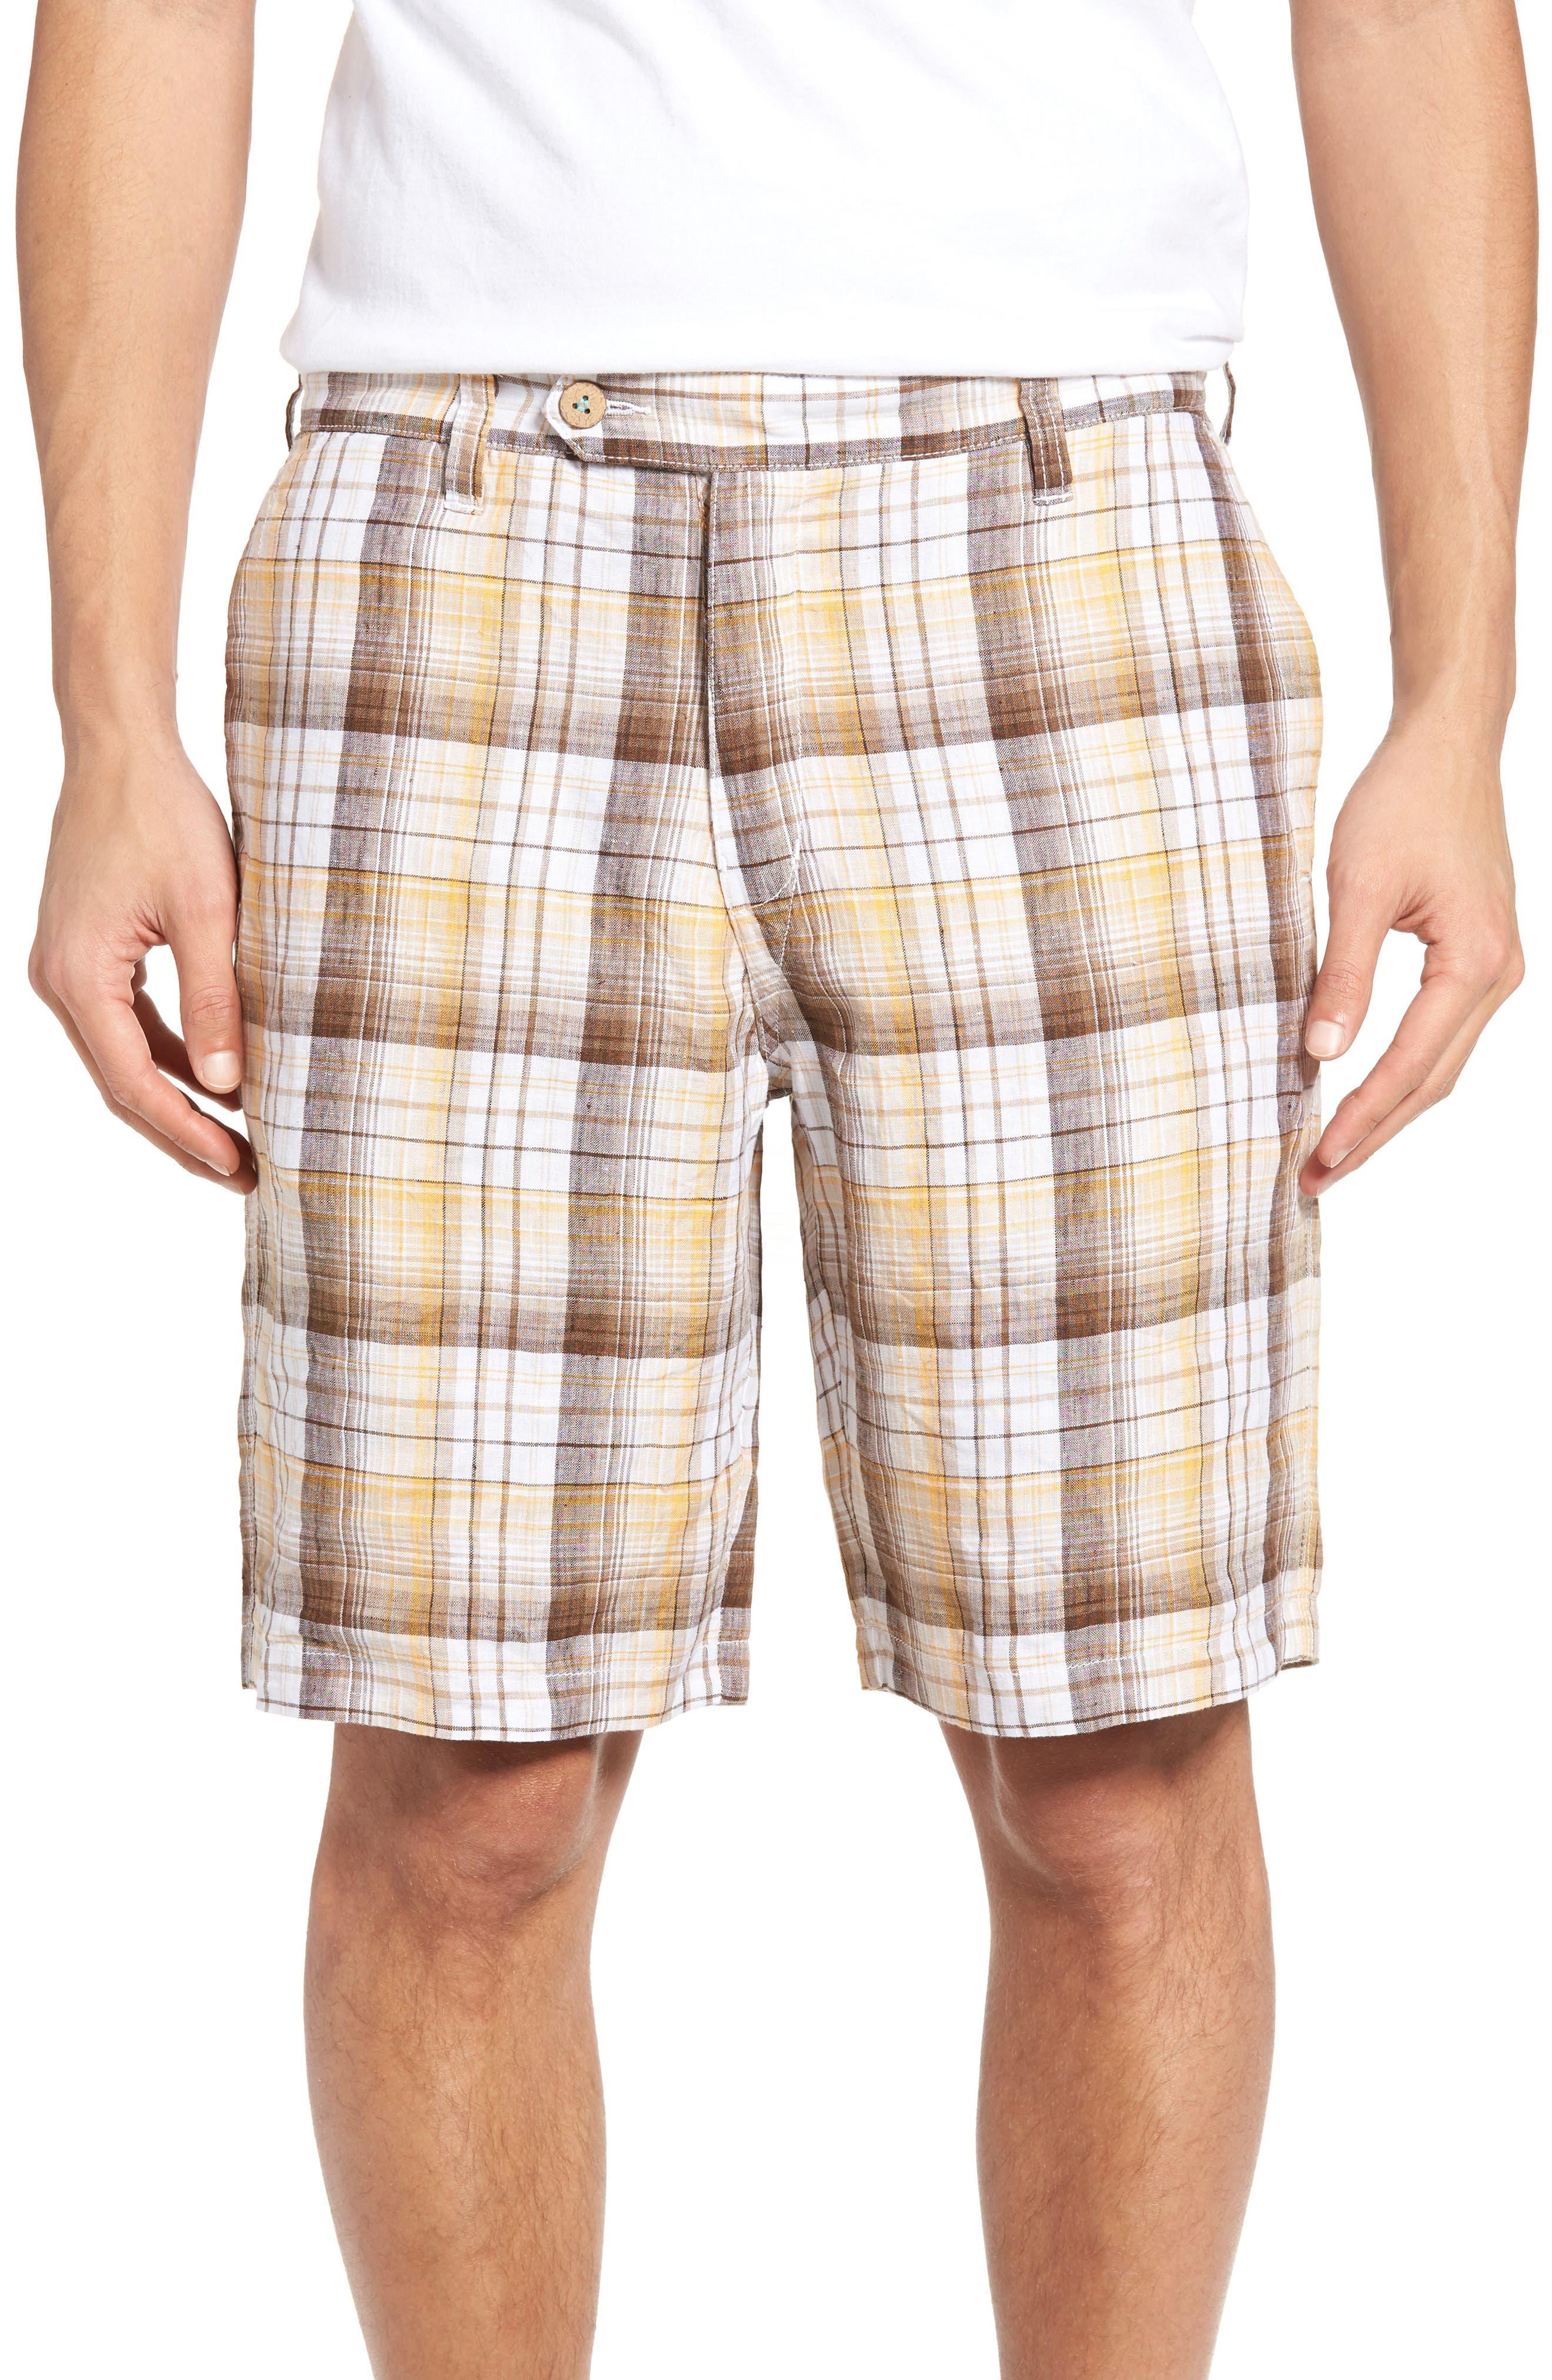 Alternate Image 1 Selected - Tommy Bahama Island Duo Reversible Linen Shorts